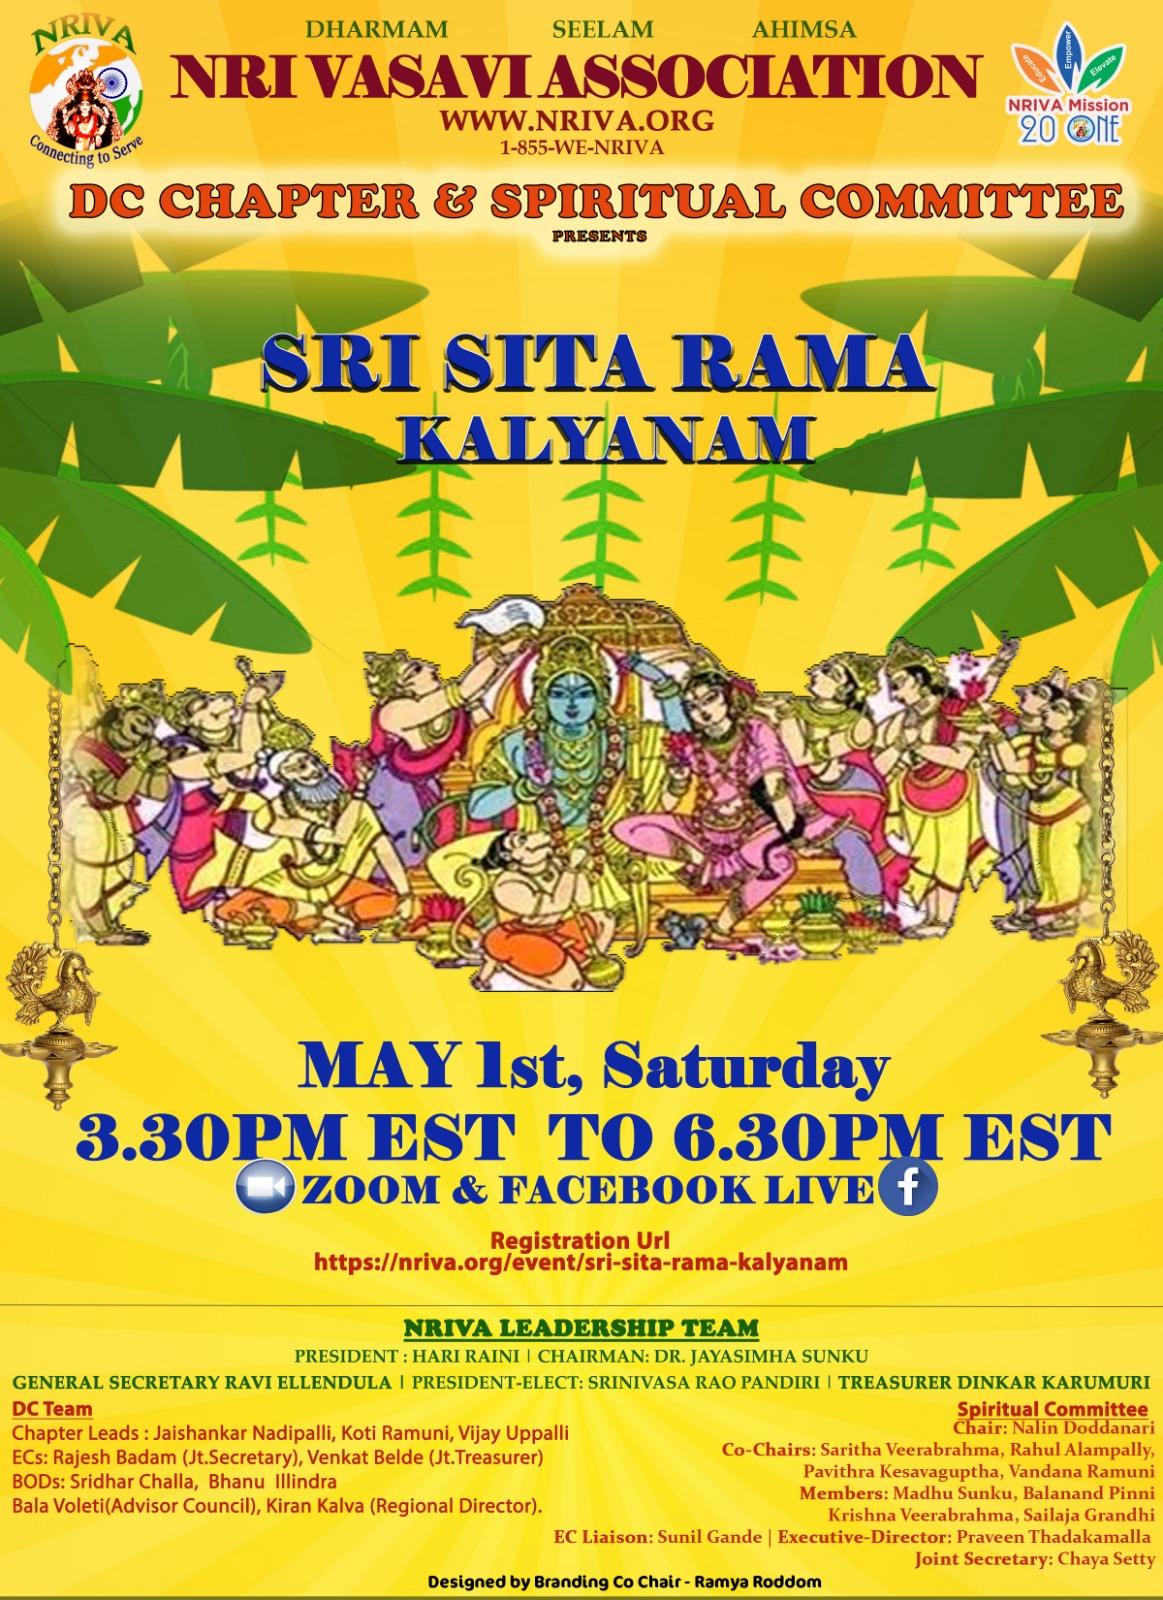 Sri Sita Rama Kalyanam